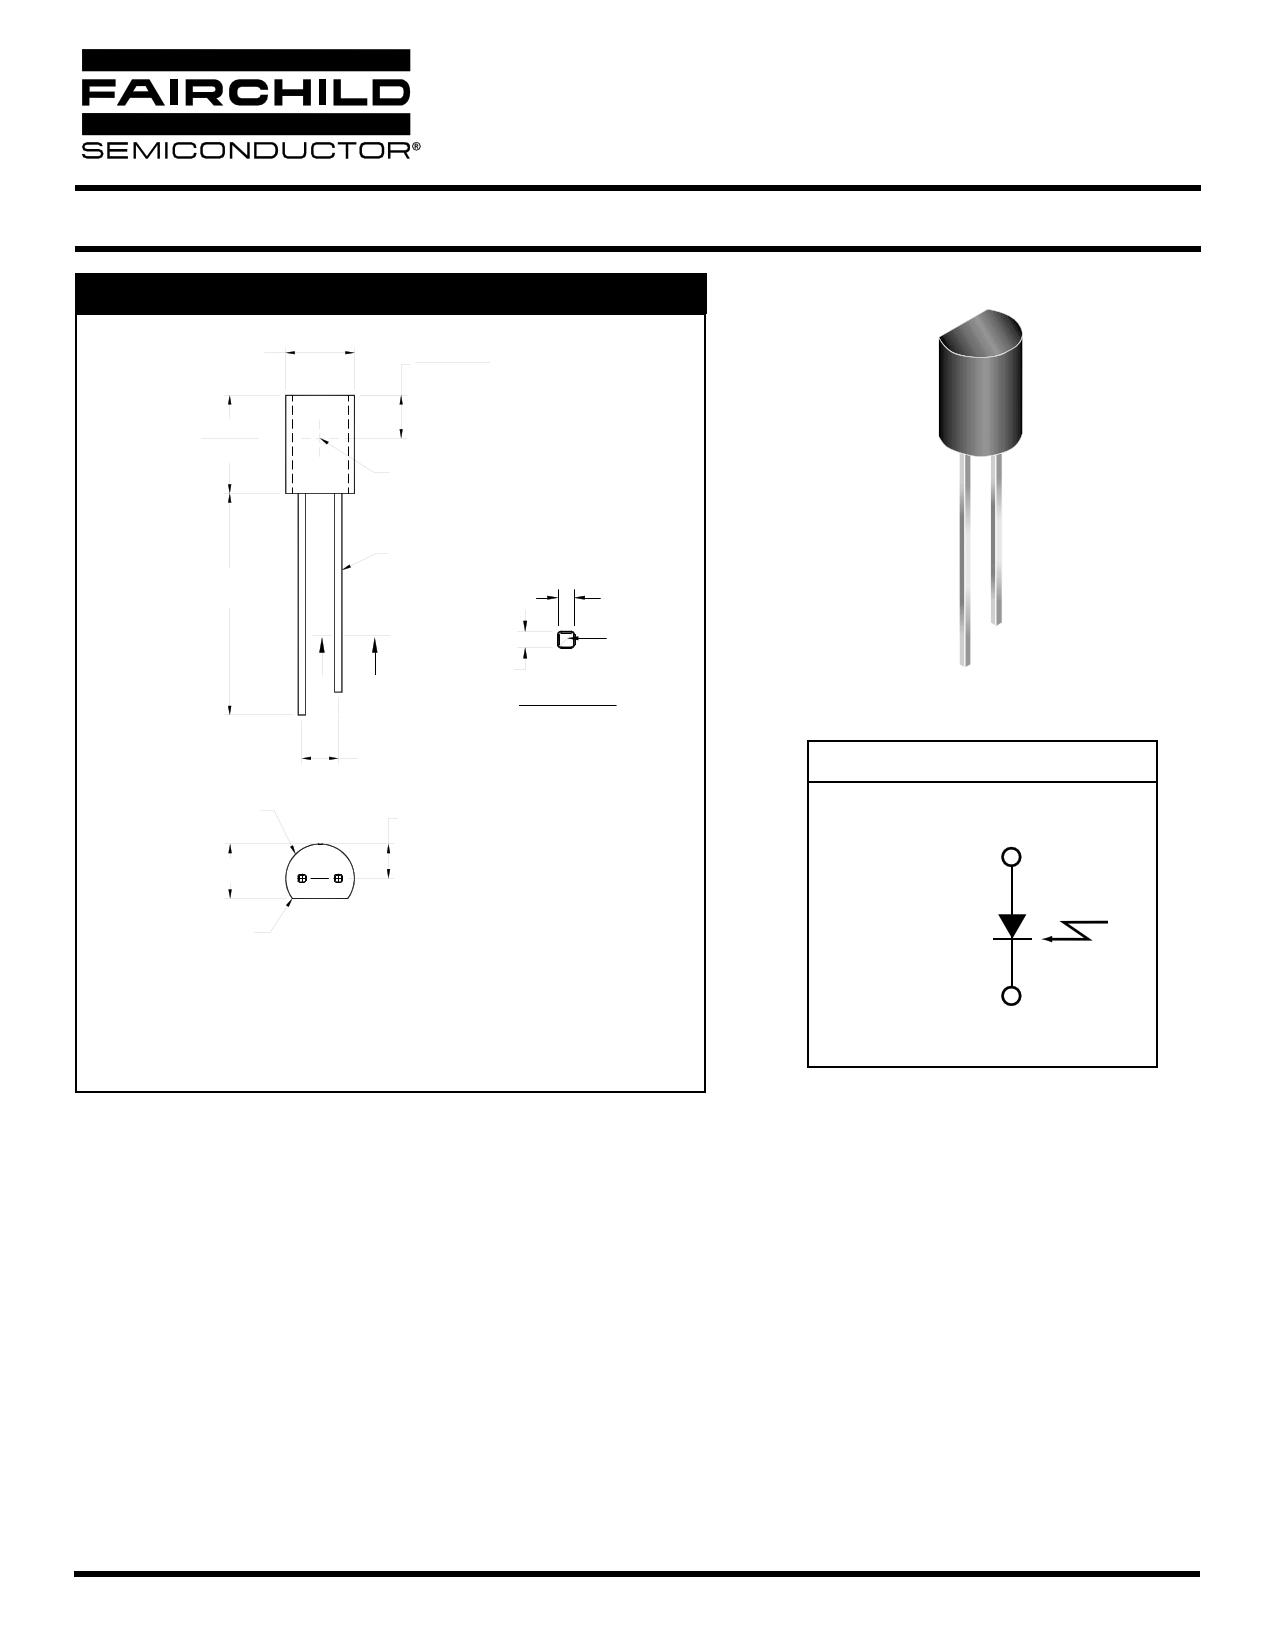 QSE973 datasheet